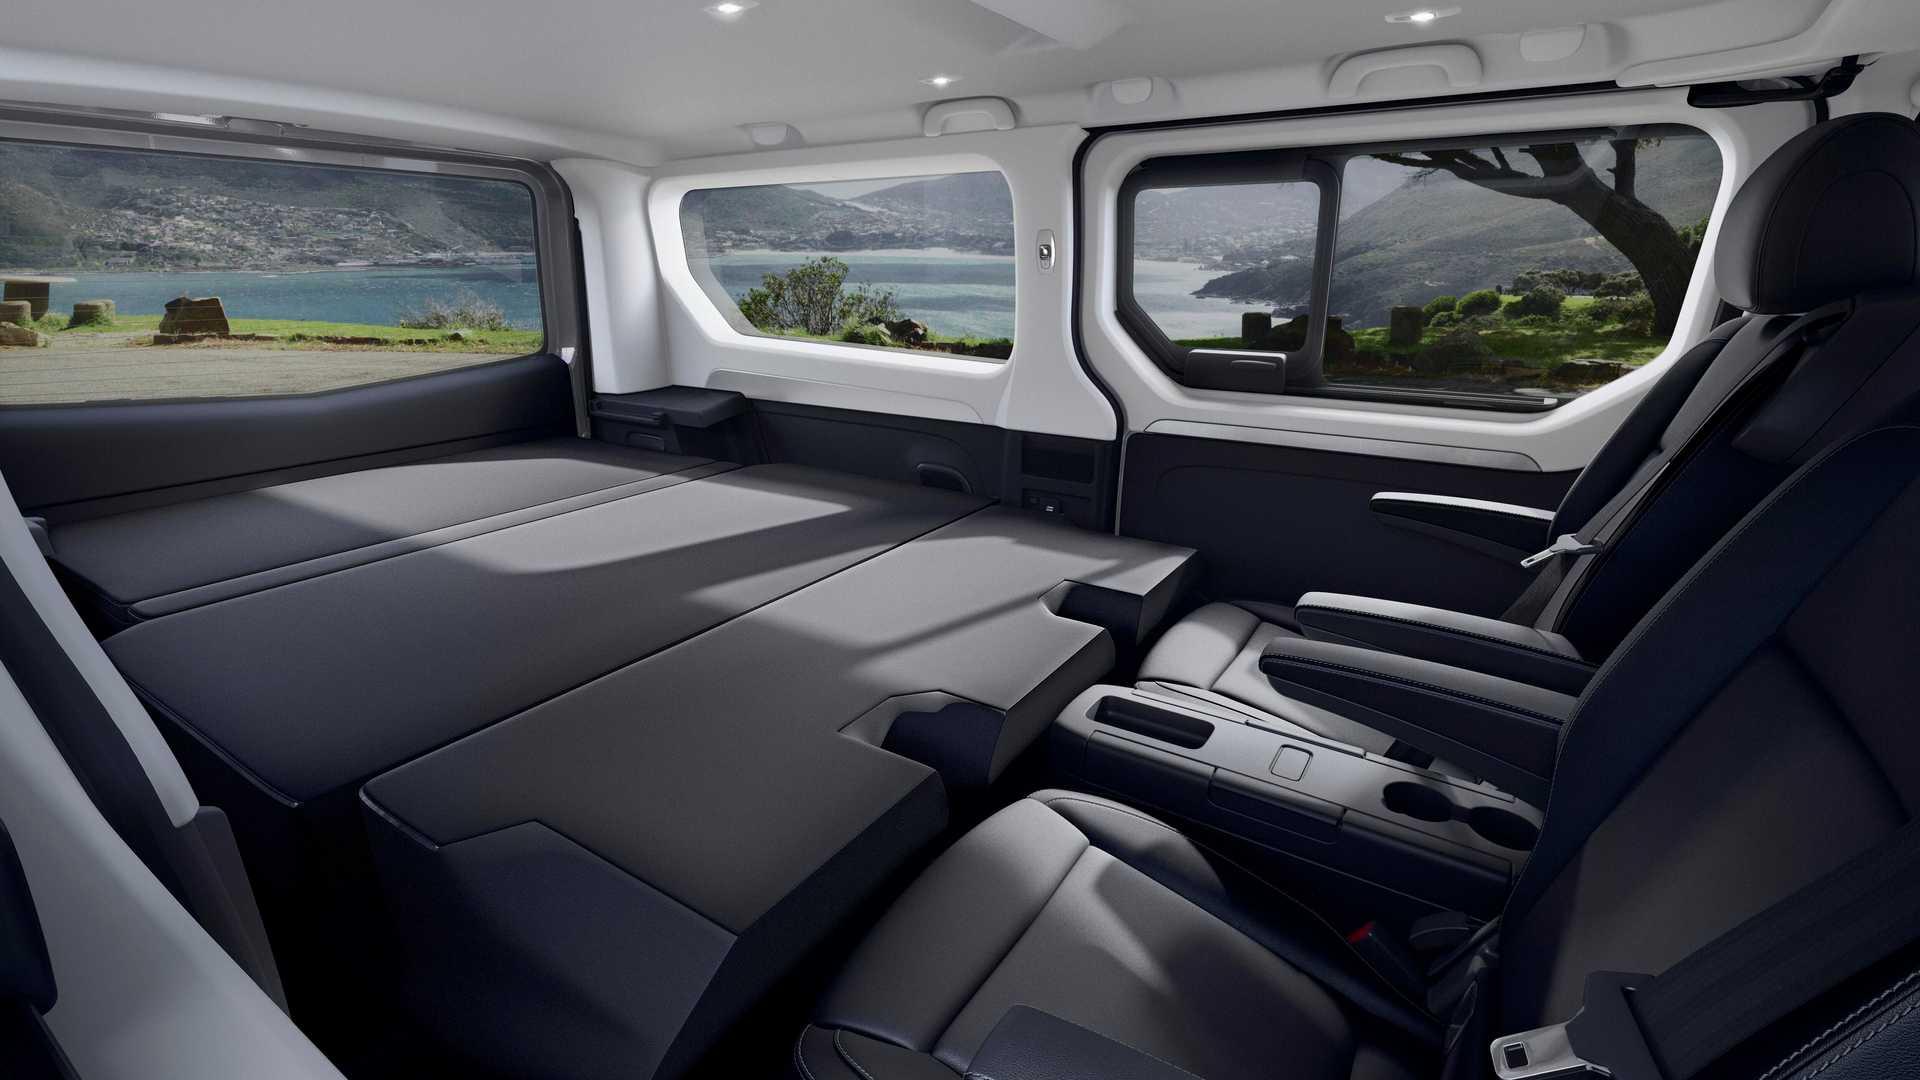 2020-renault-trafic-facelift-interior (2)